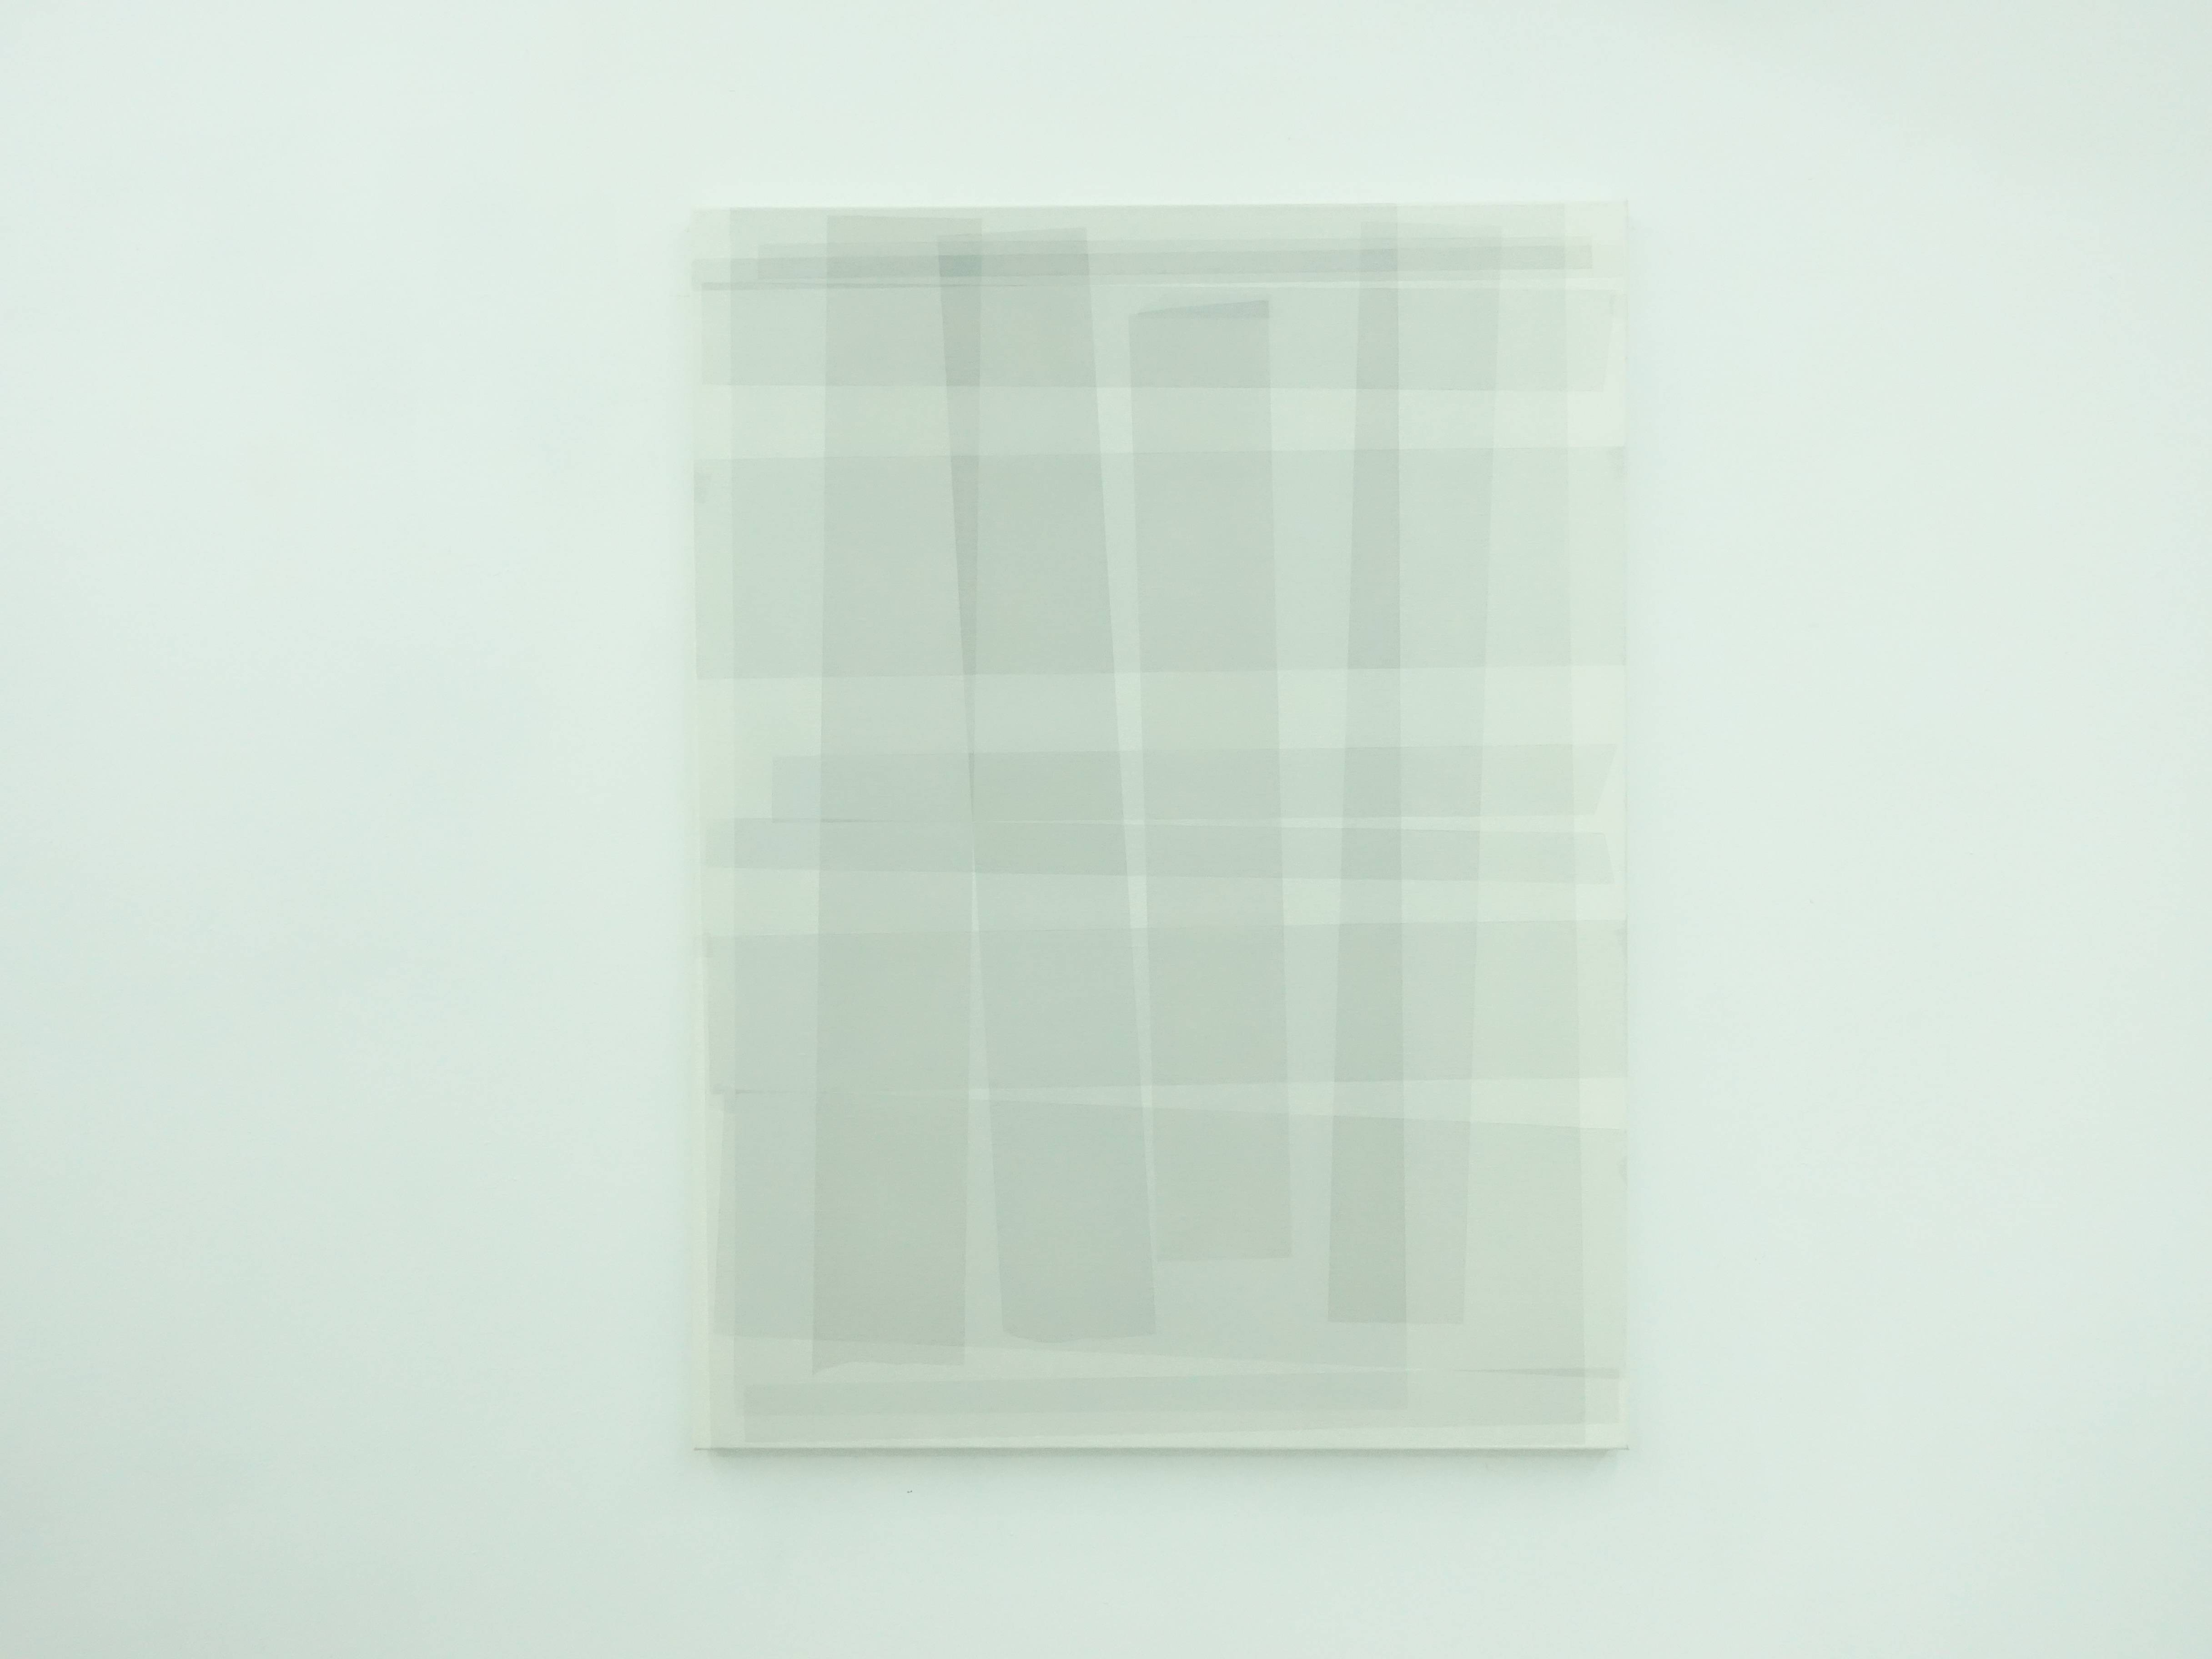 Kees Goudzwaard,《Transparent on white透徹於白之上》,Oil on canvas,100 x 75 cm,2019。